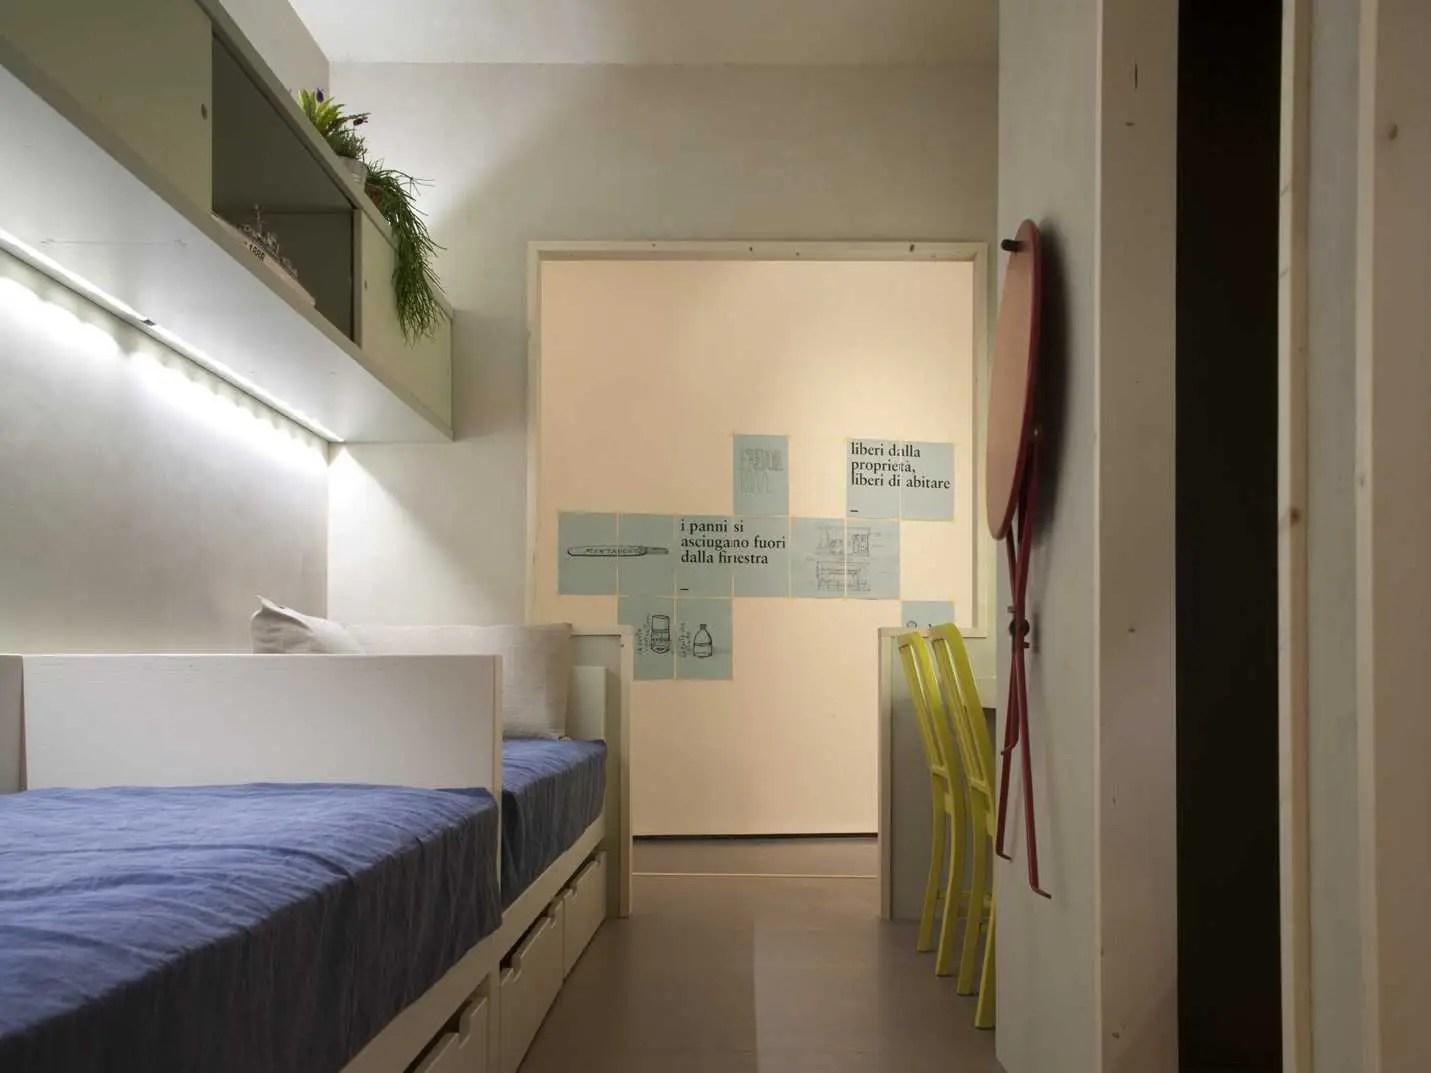 Italian Prisoners Design MiniApartment  Business Insider